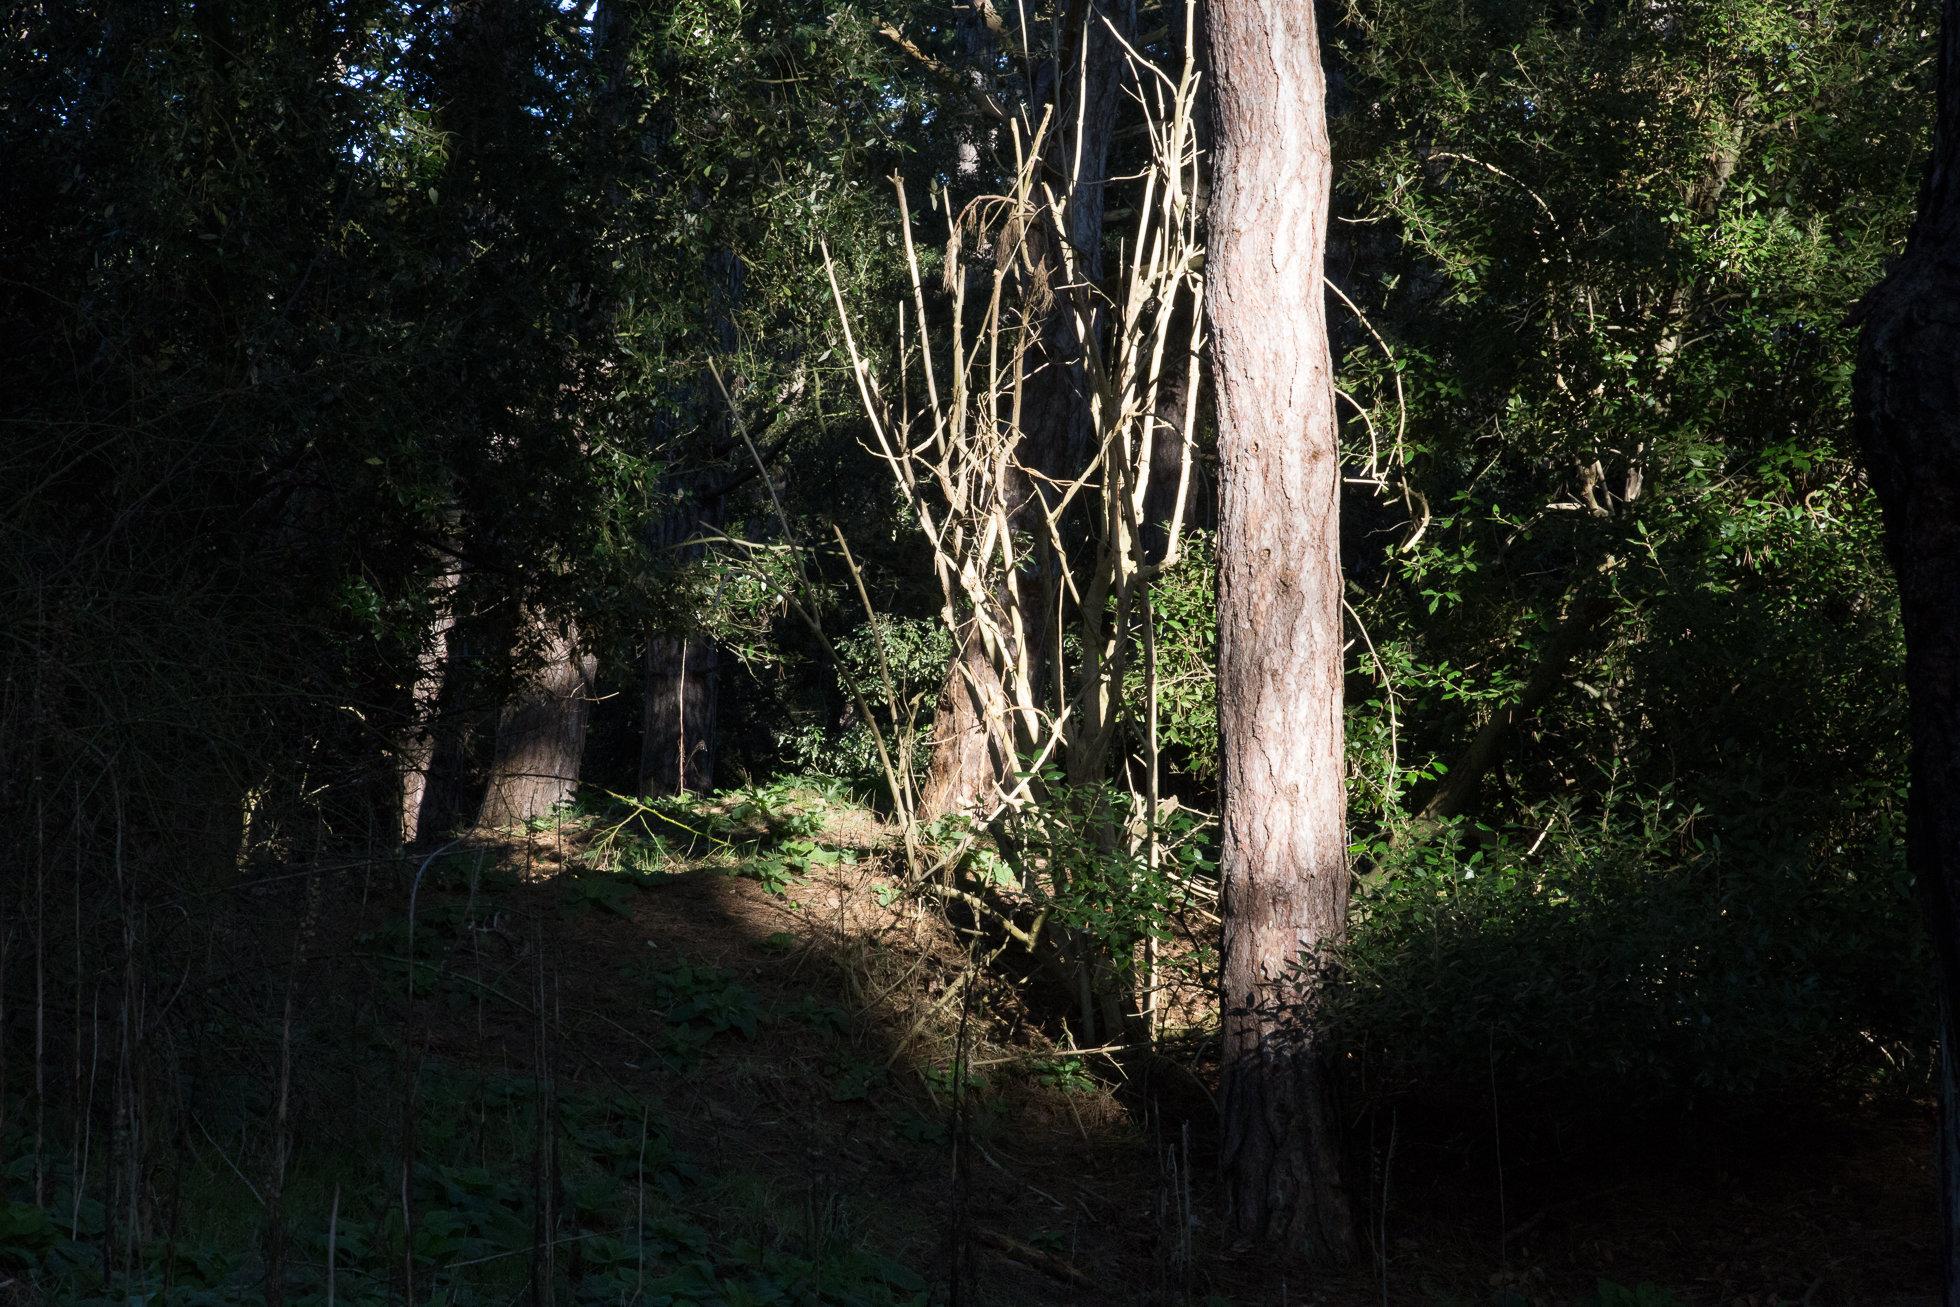 The_Wood-9097.jpg